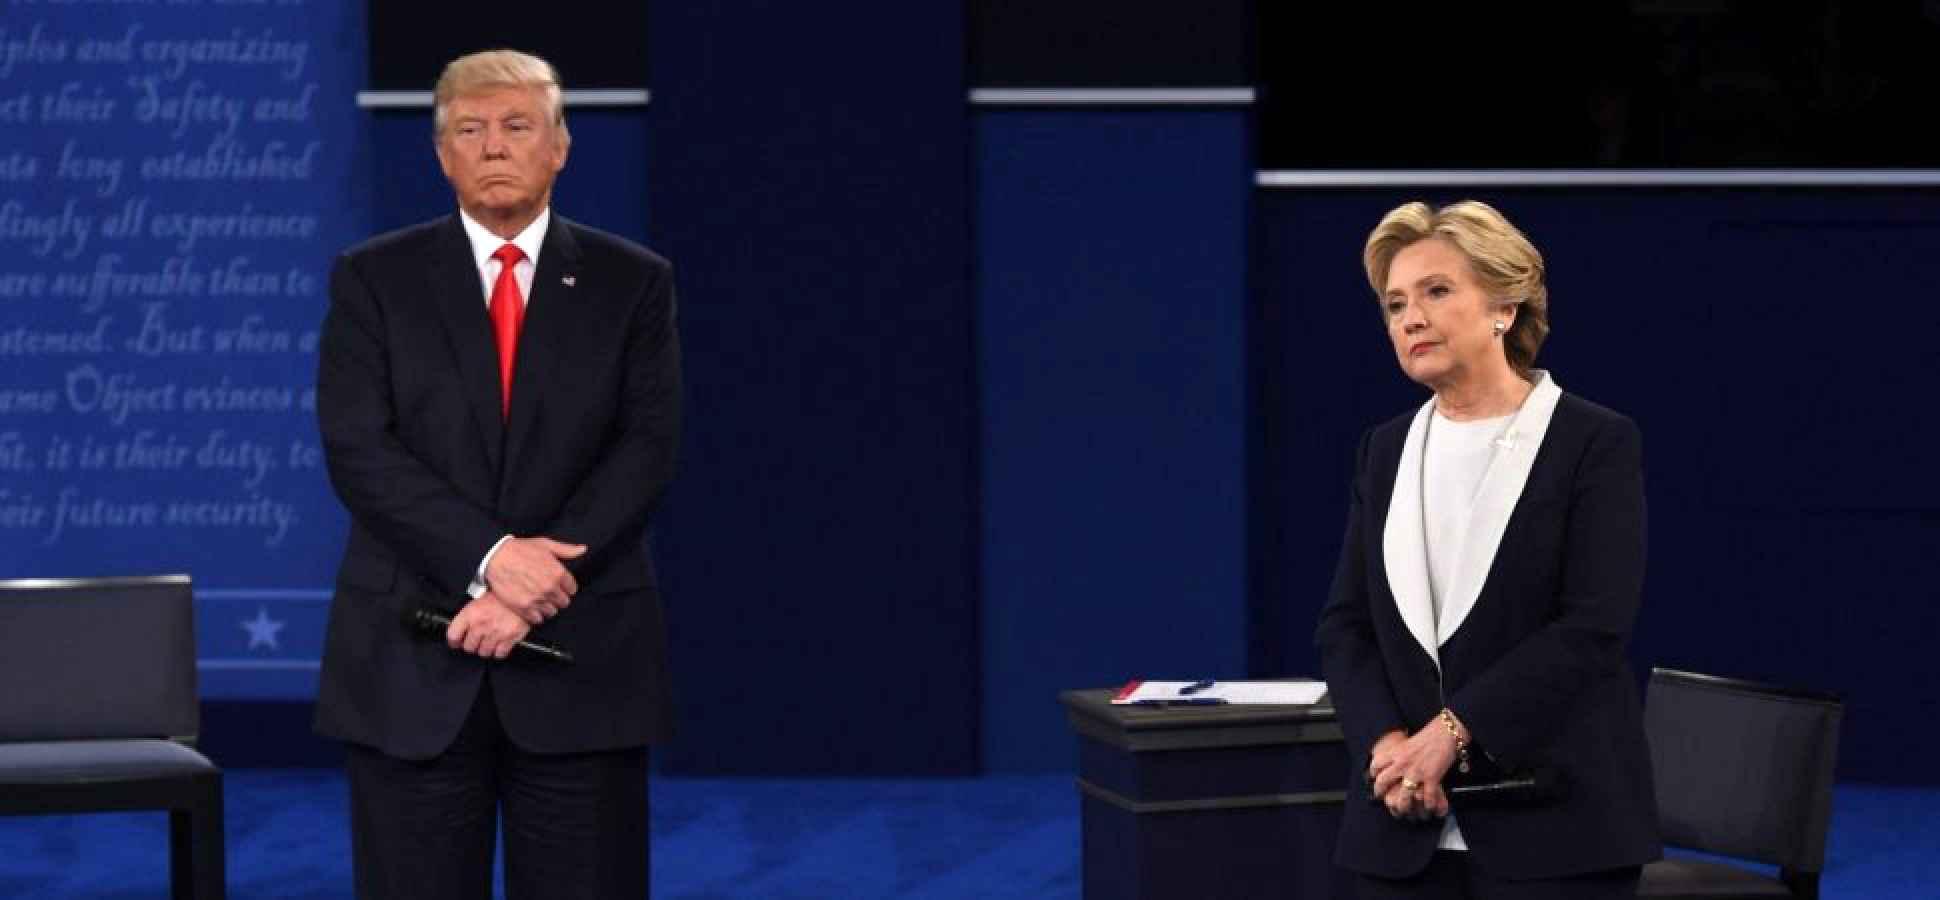 The 5 Biggest Body Language Fails of the Presidential Debate (and 1 Brilliant Subconscious Cue)